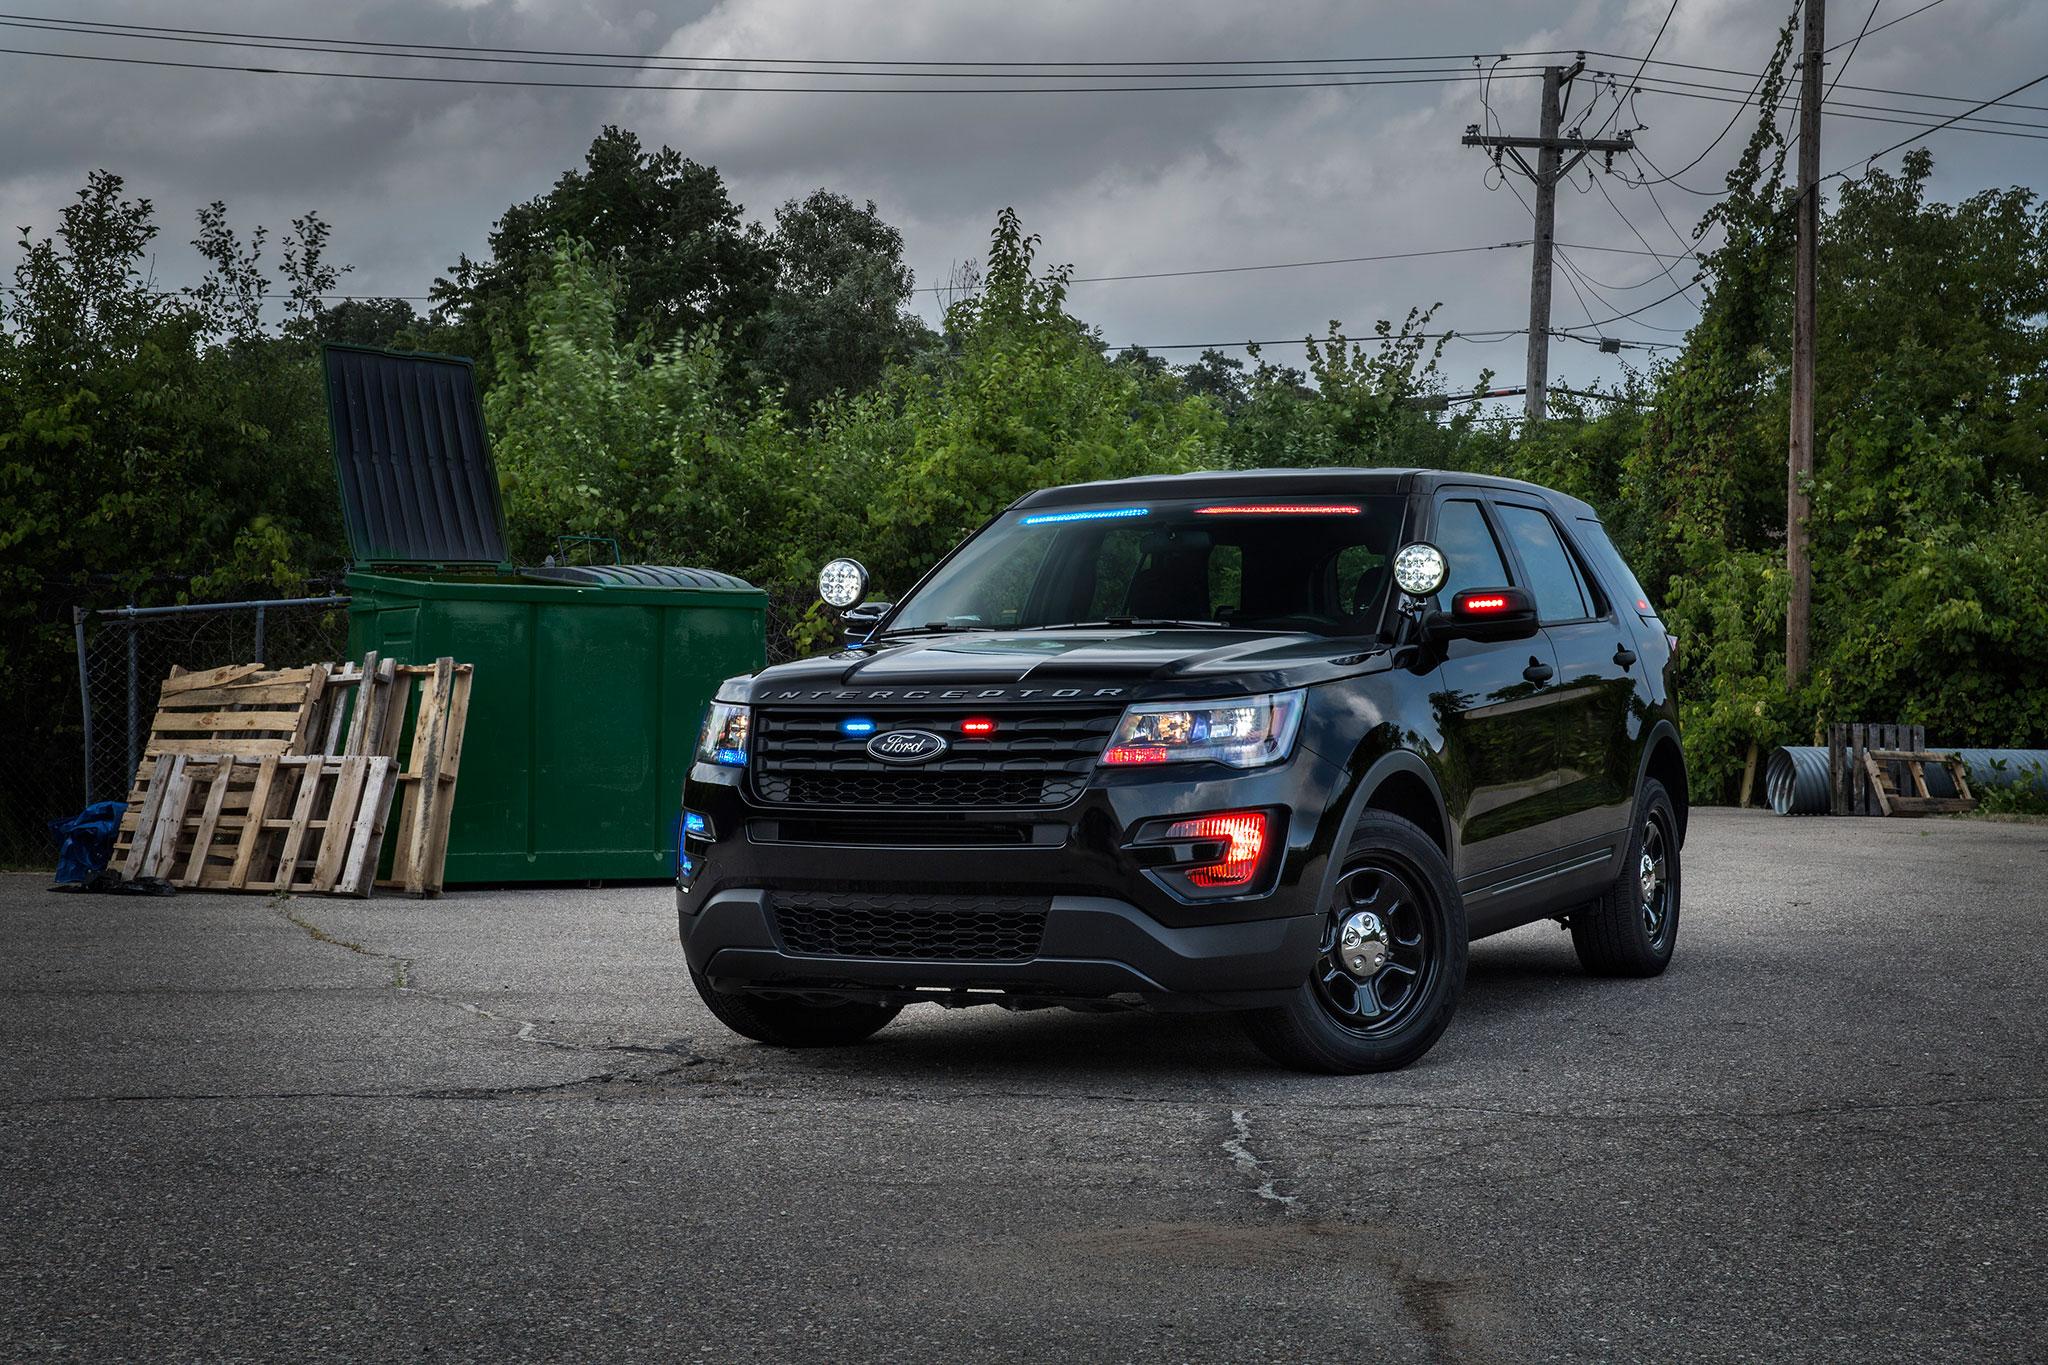 Ford Police Interceptor Utility Gets Subtle No Profile Light Bar Automobile